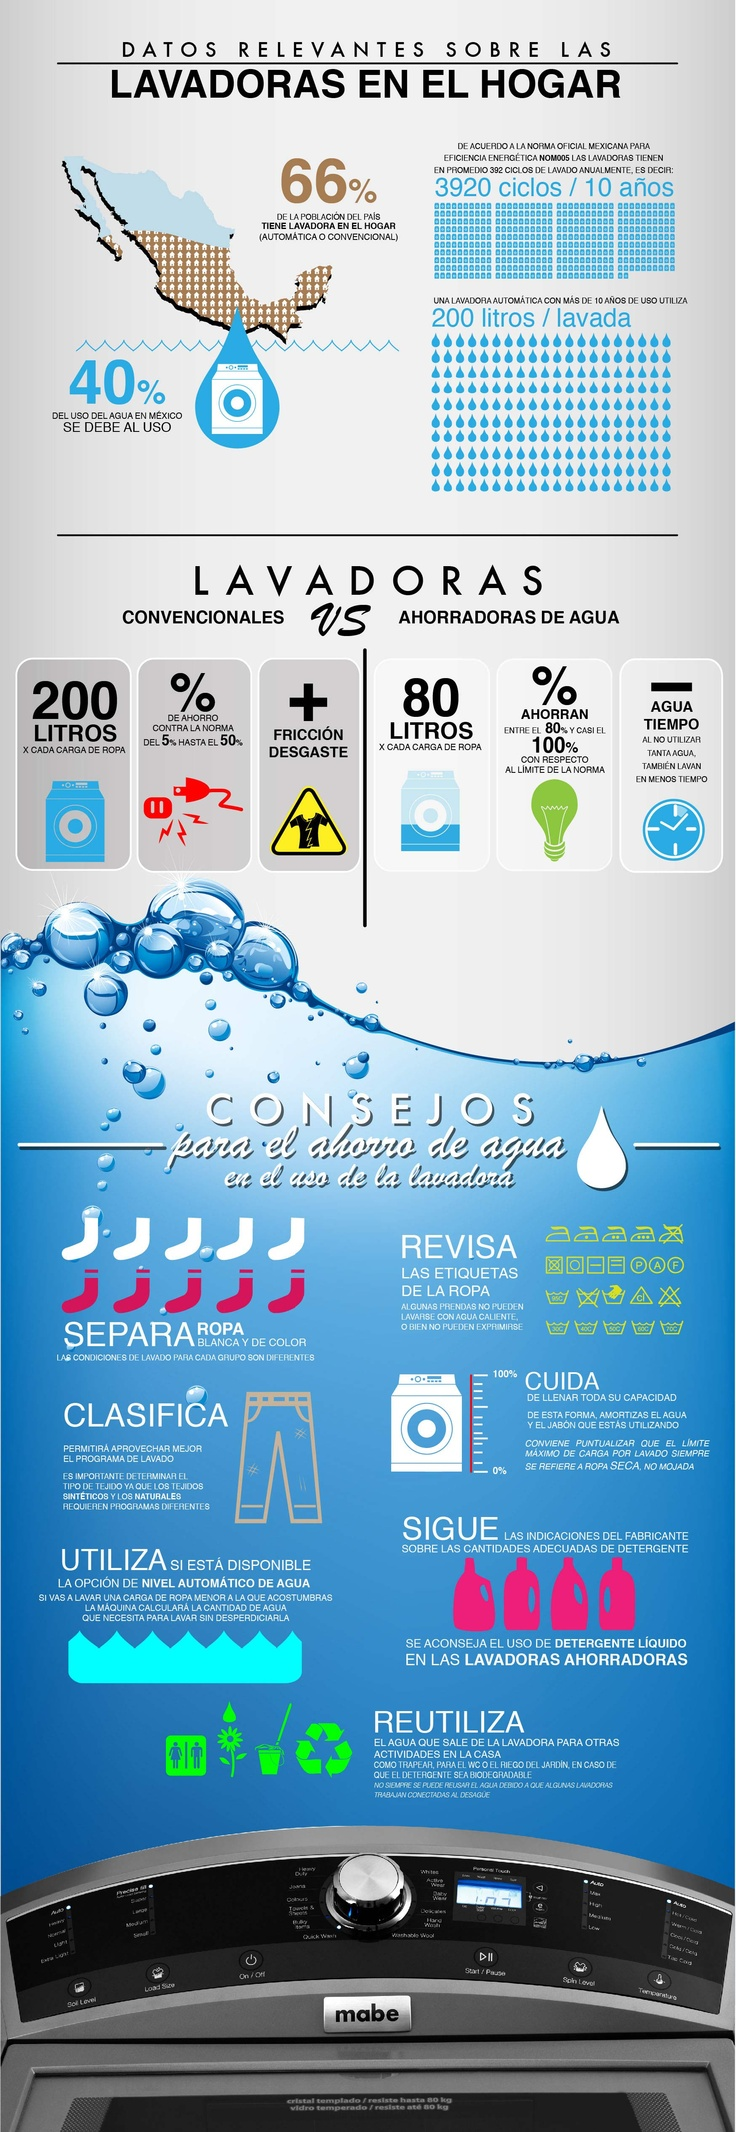 17 best images about grandes ideas responsables on for Ideas para ahorrar agua